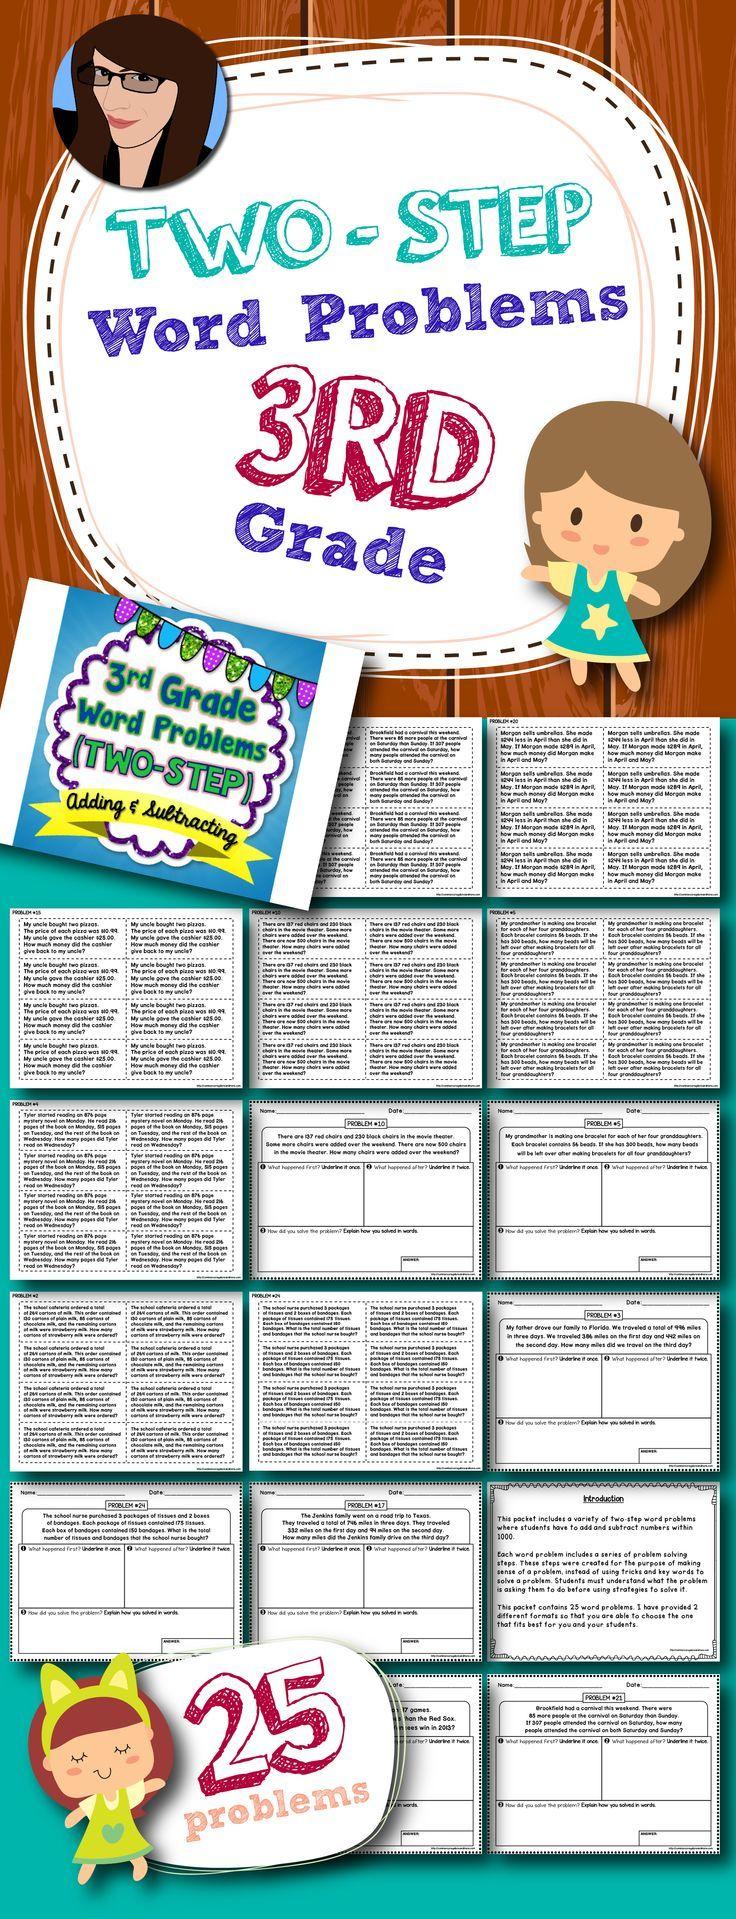 Two-Step Word Problems - 3rd Grade | Problemas de palabras